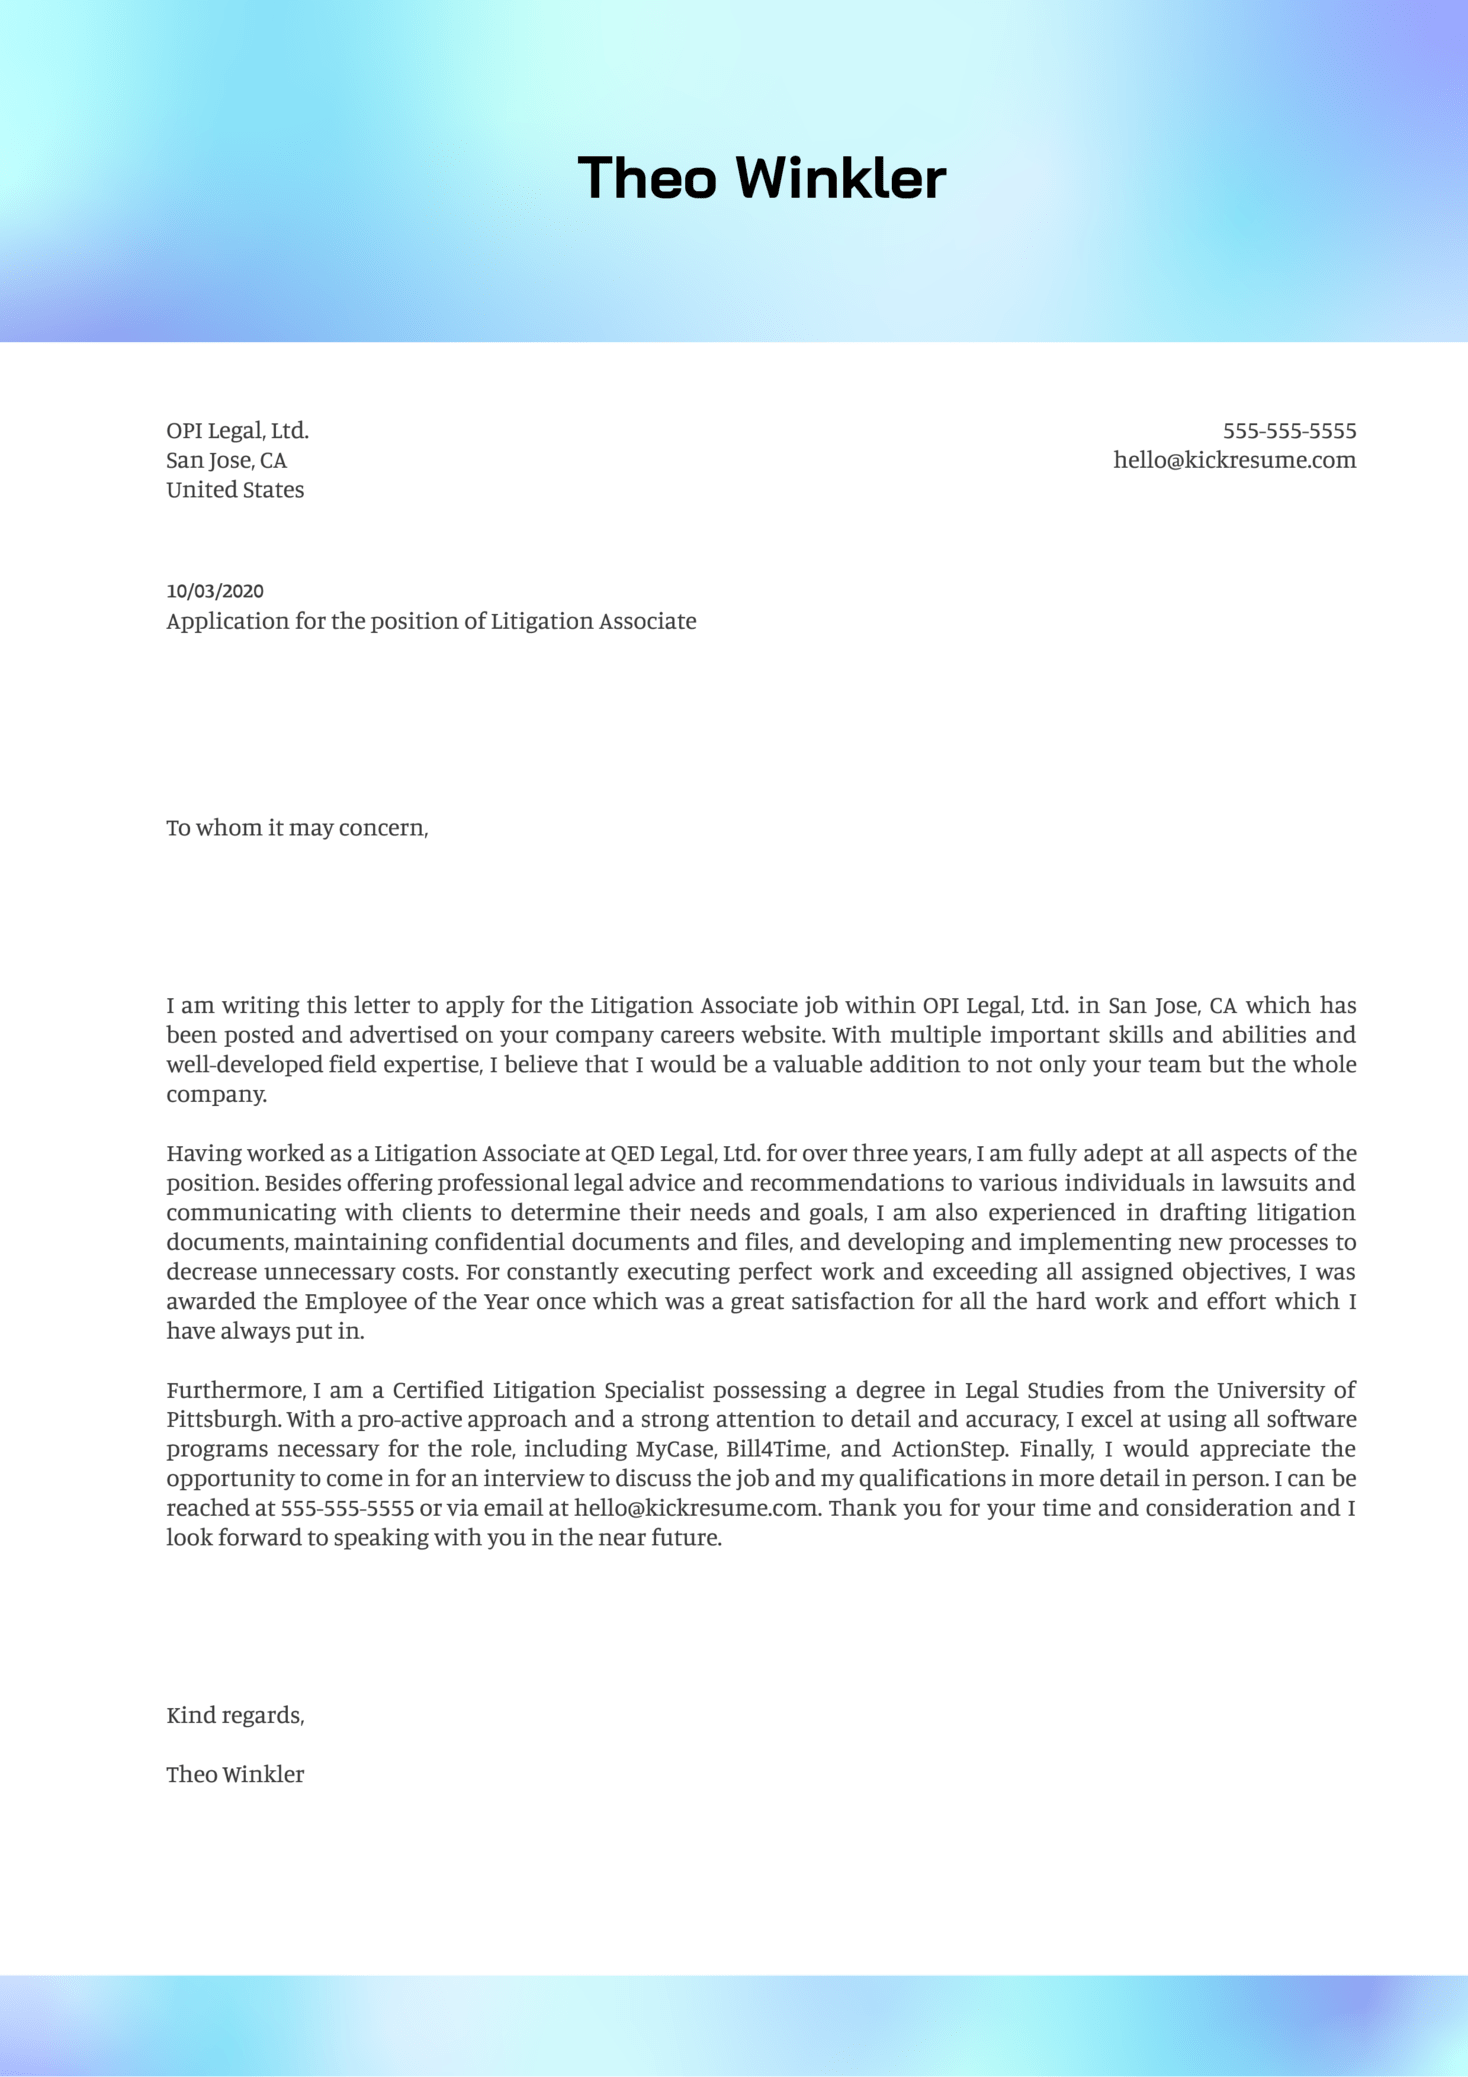 Litigation Associate Cover Letter Example